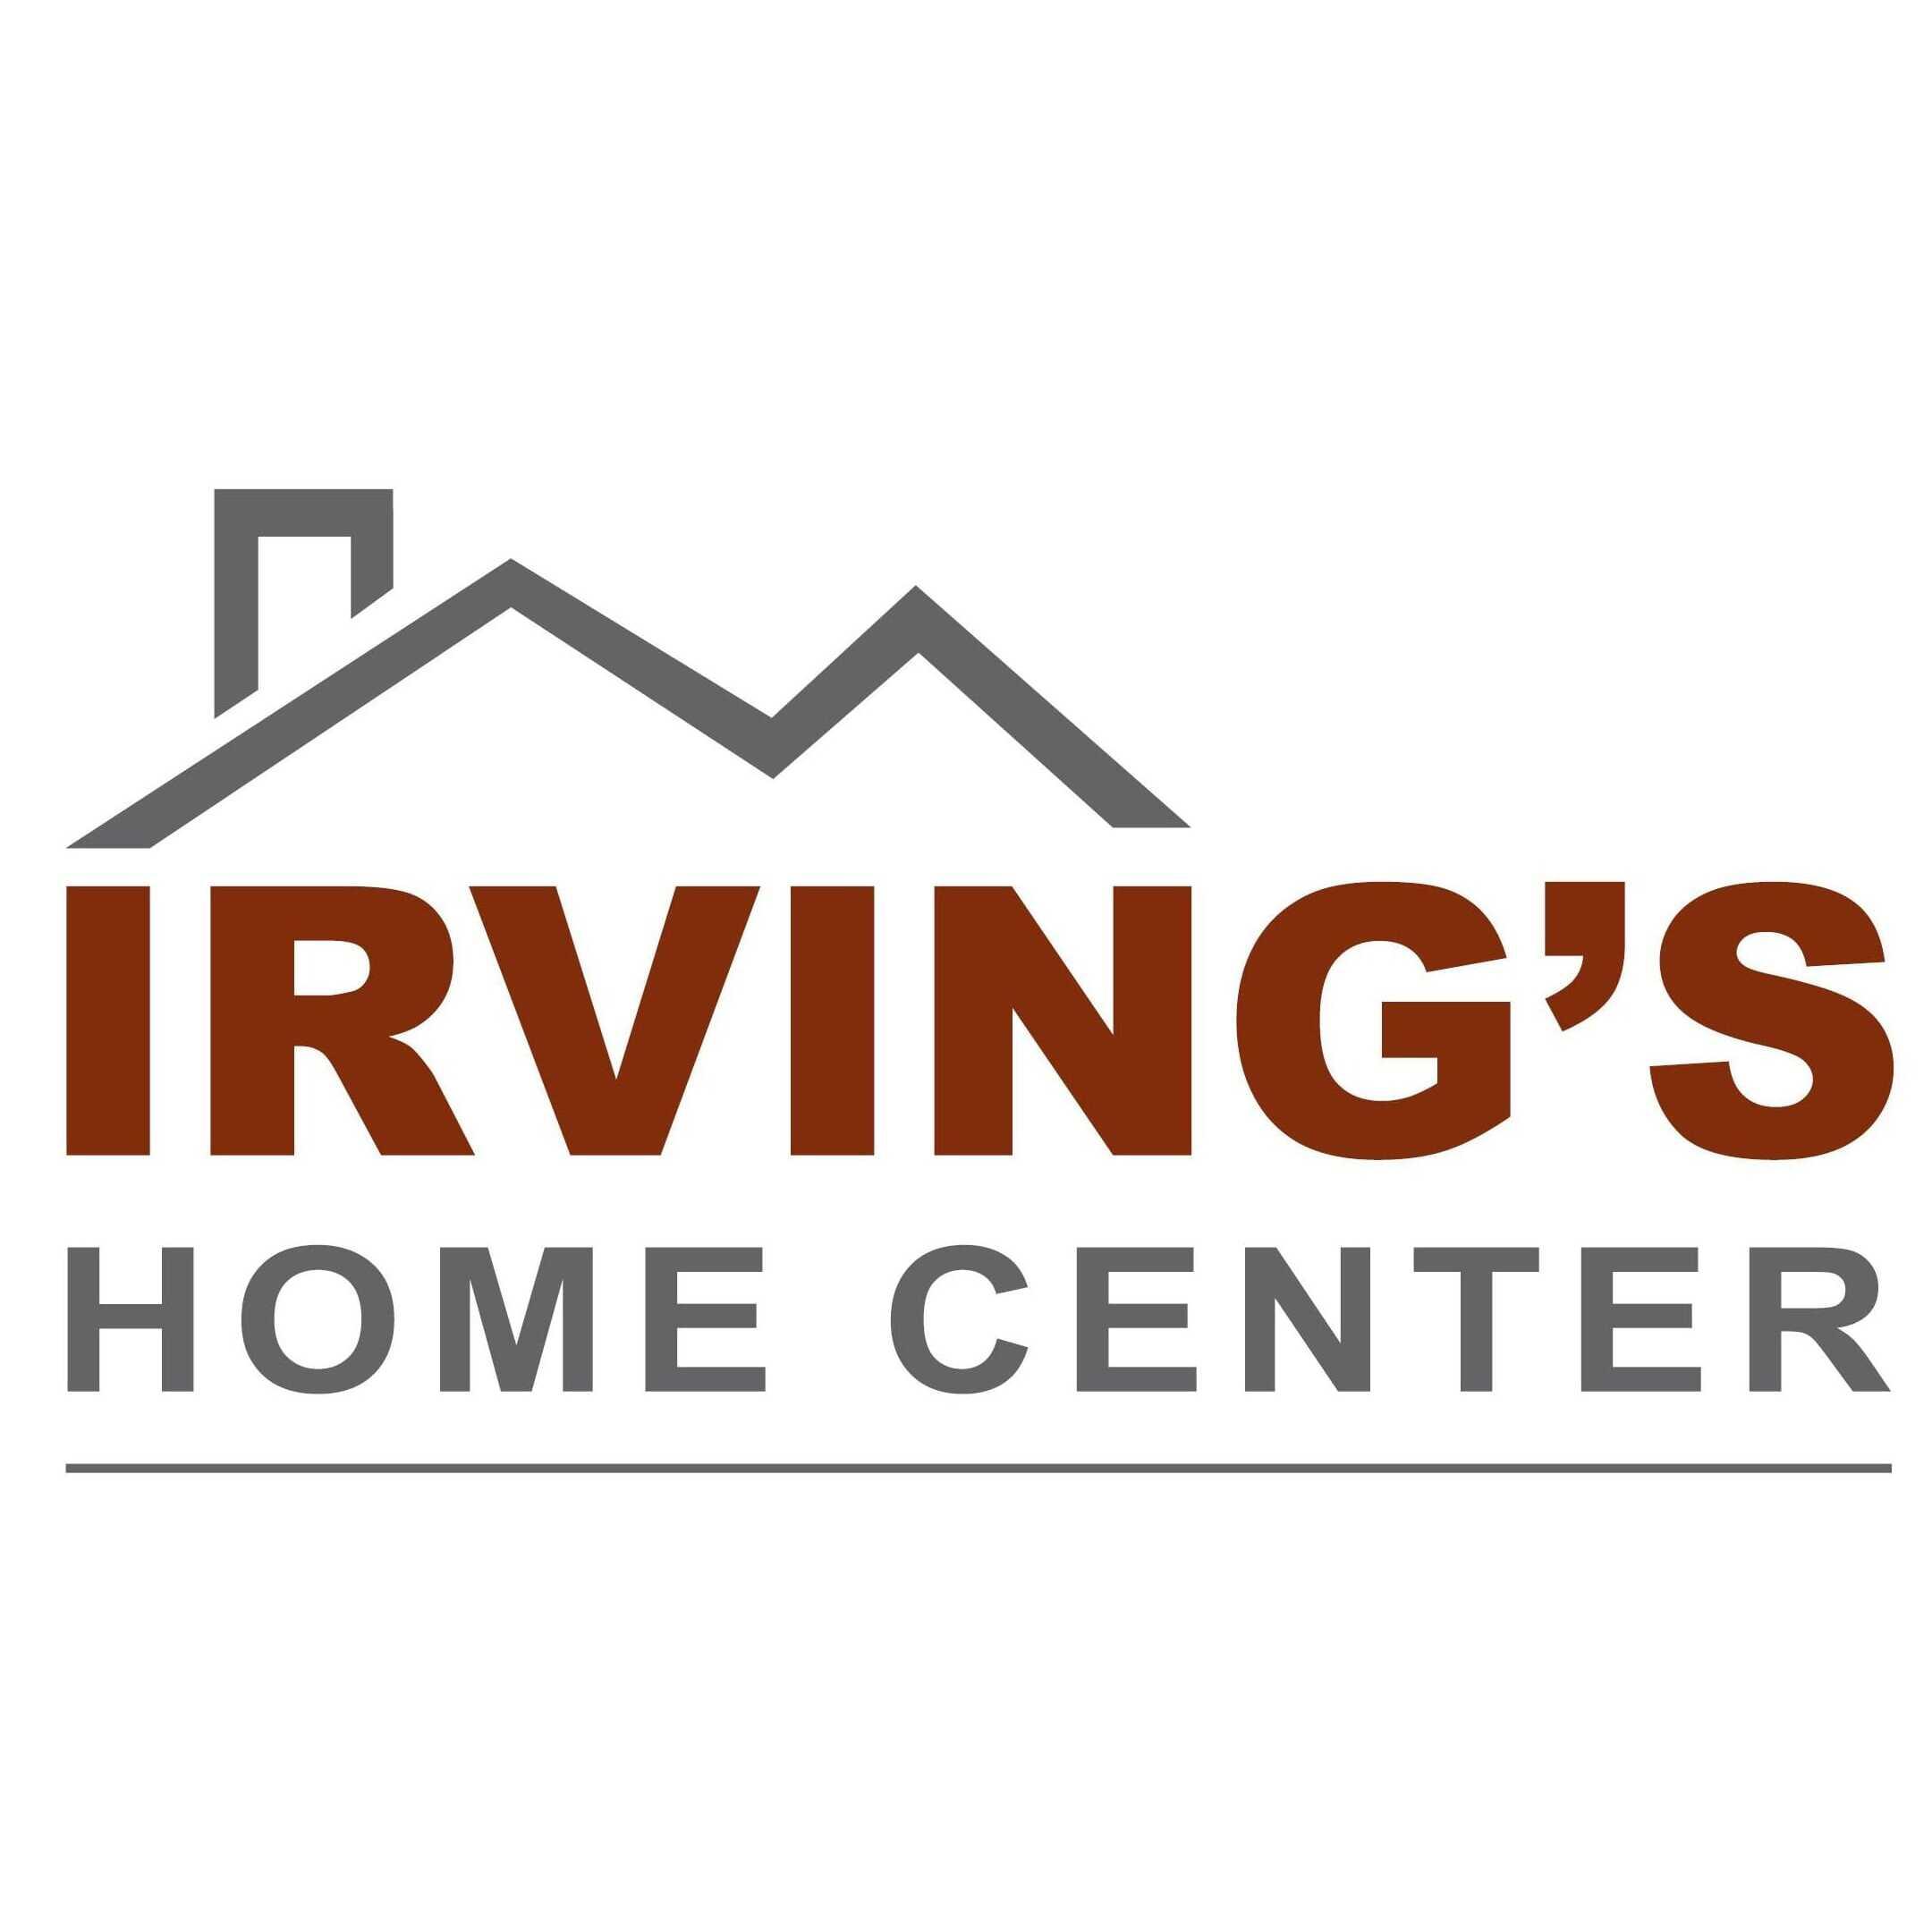 Irving's Home Center